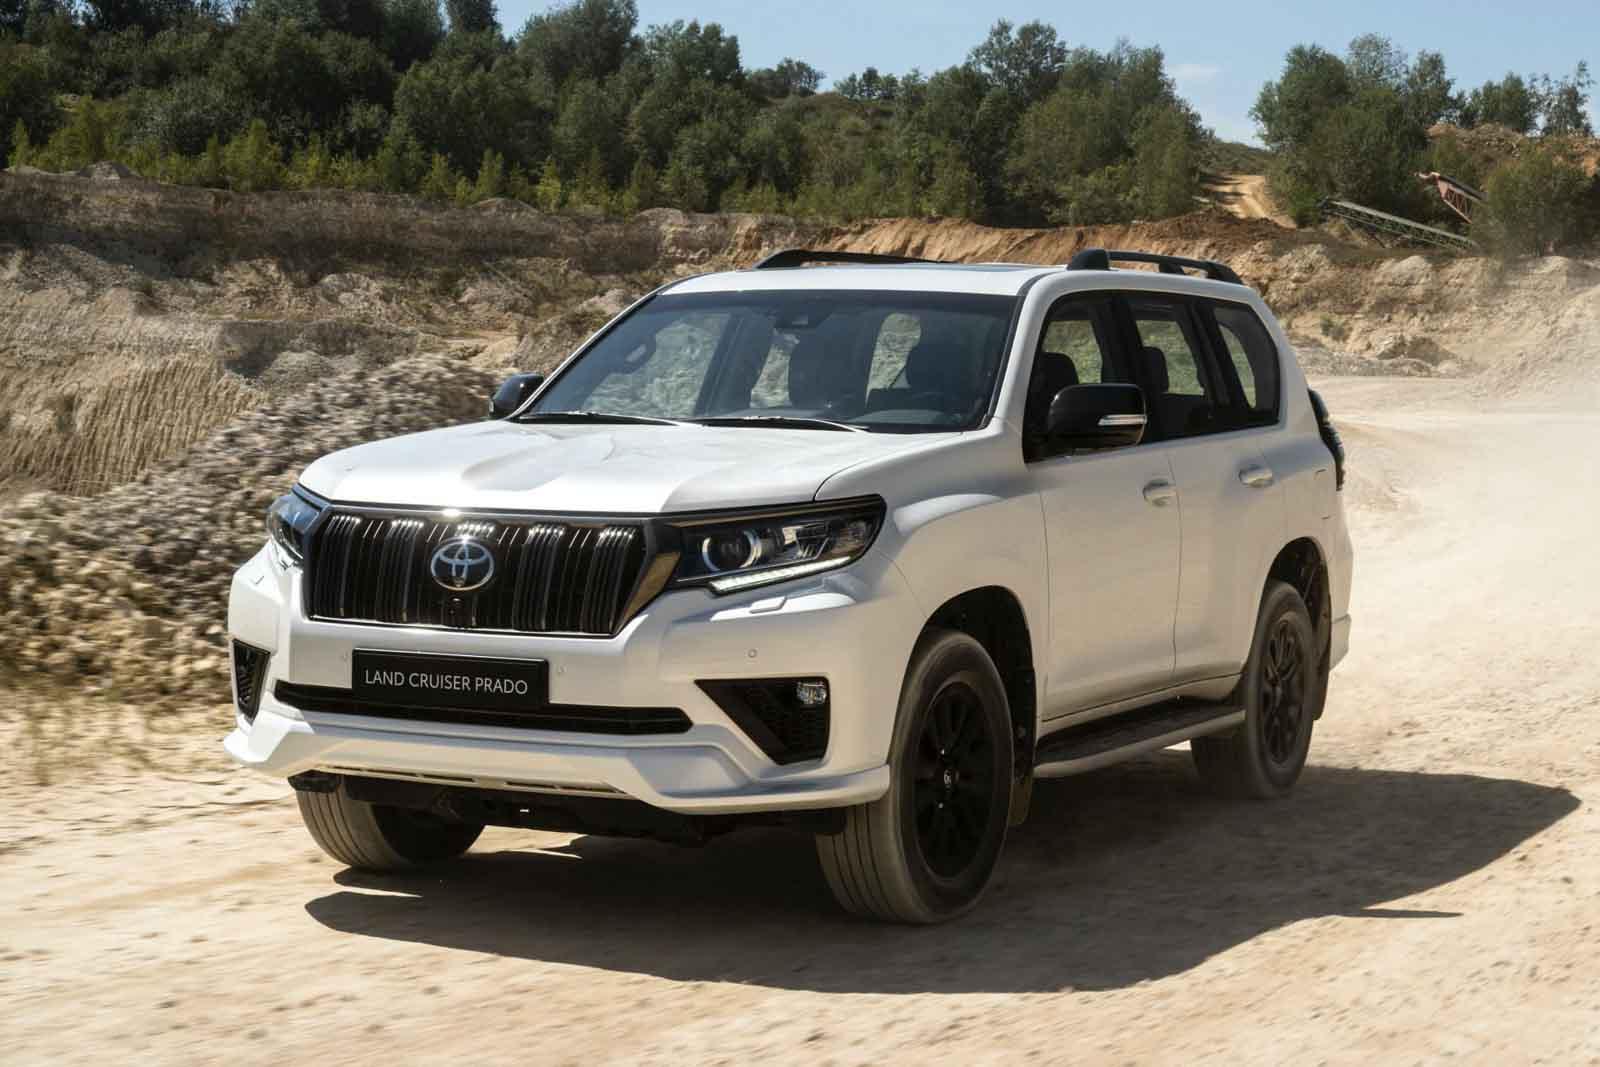 2021 Toyota Prado Price and Review